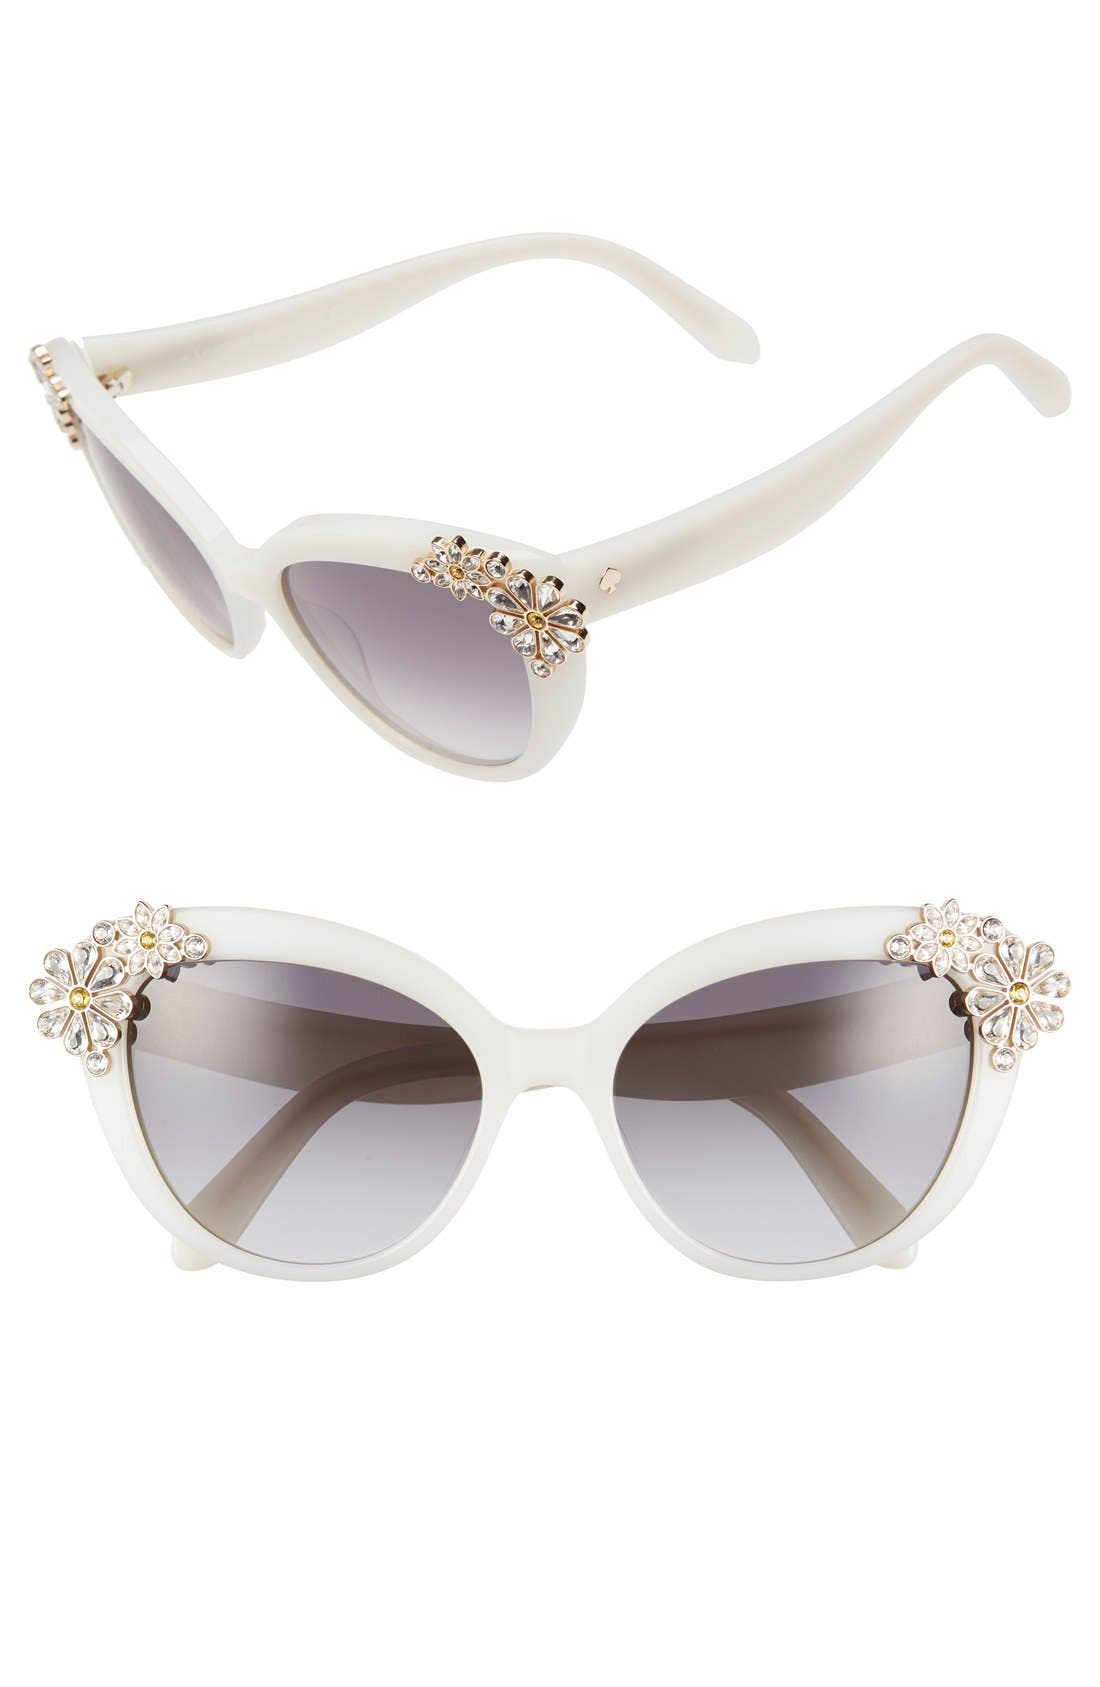 Alternate Image 1 Selected - kate spade new york 'karyna' 55mm cat eye sunglasses